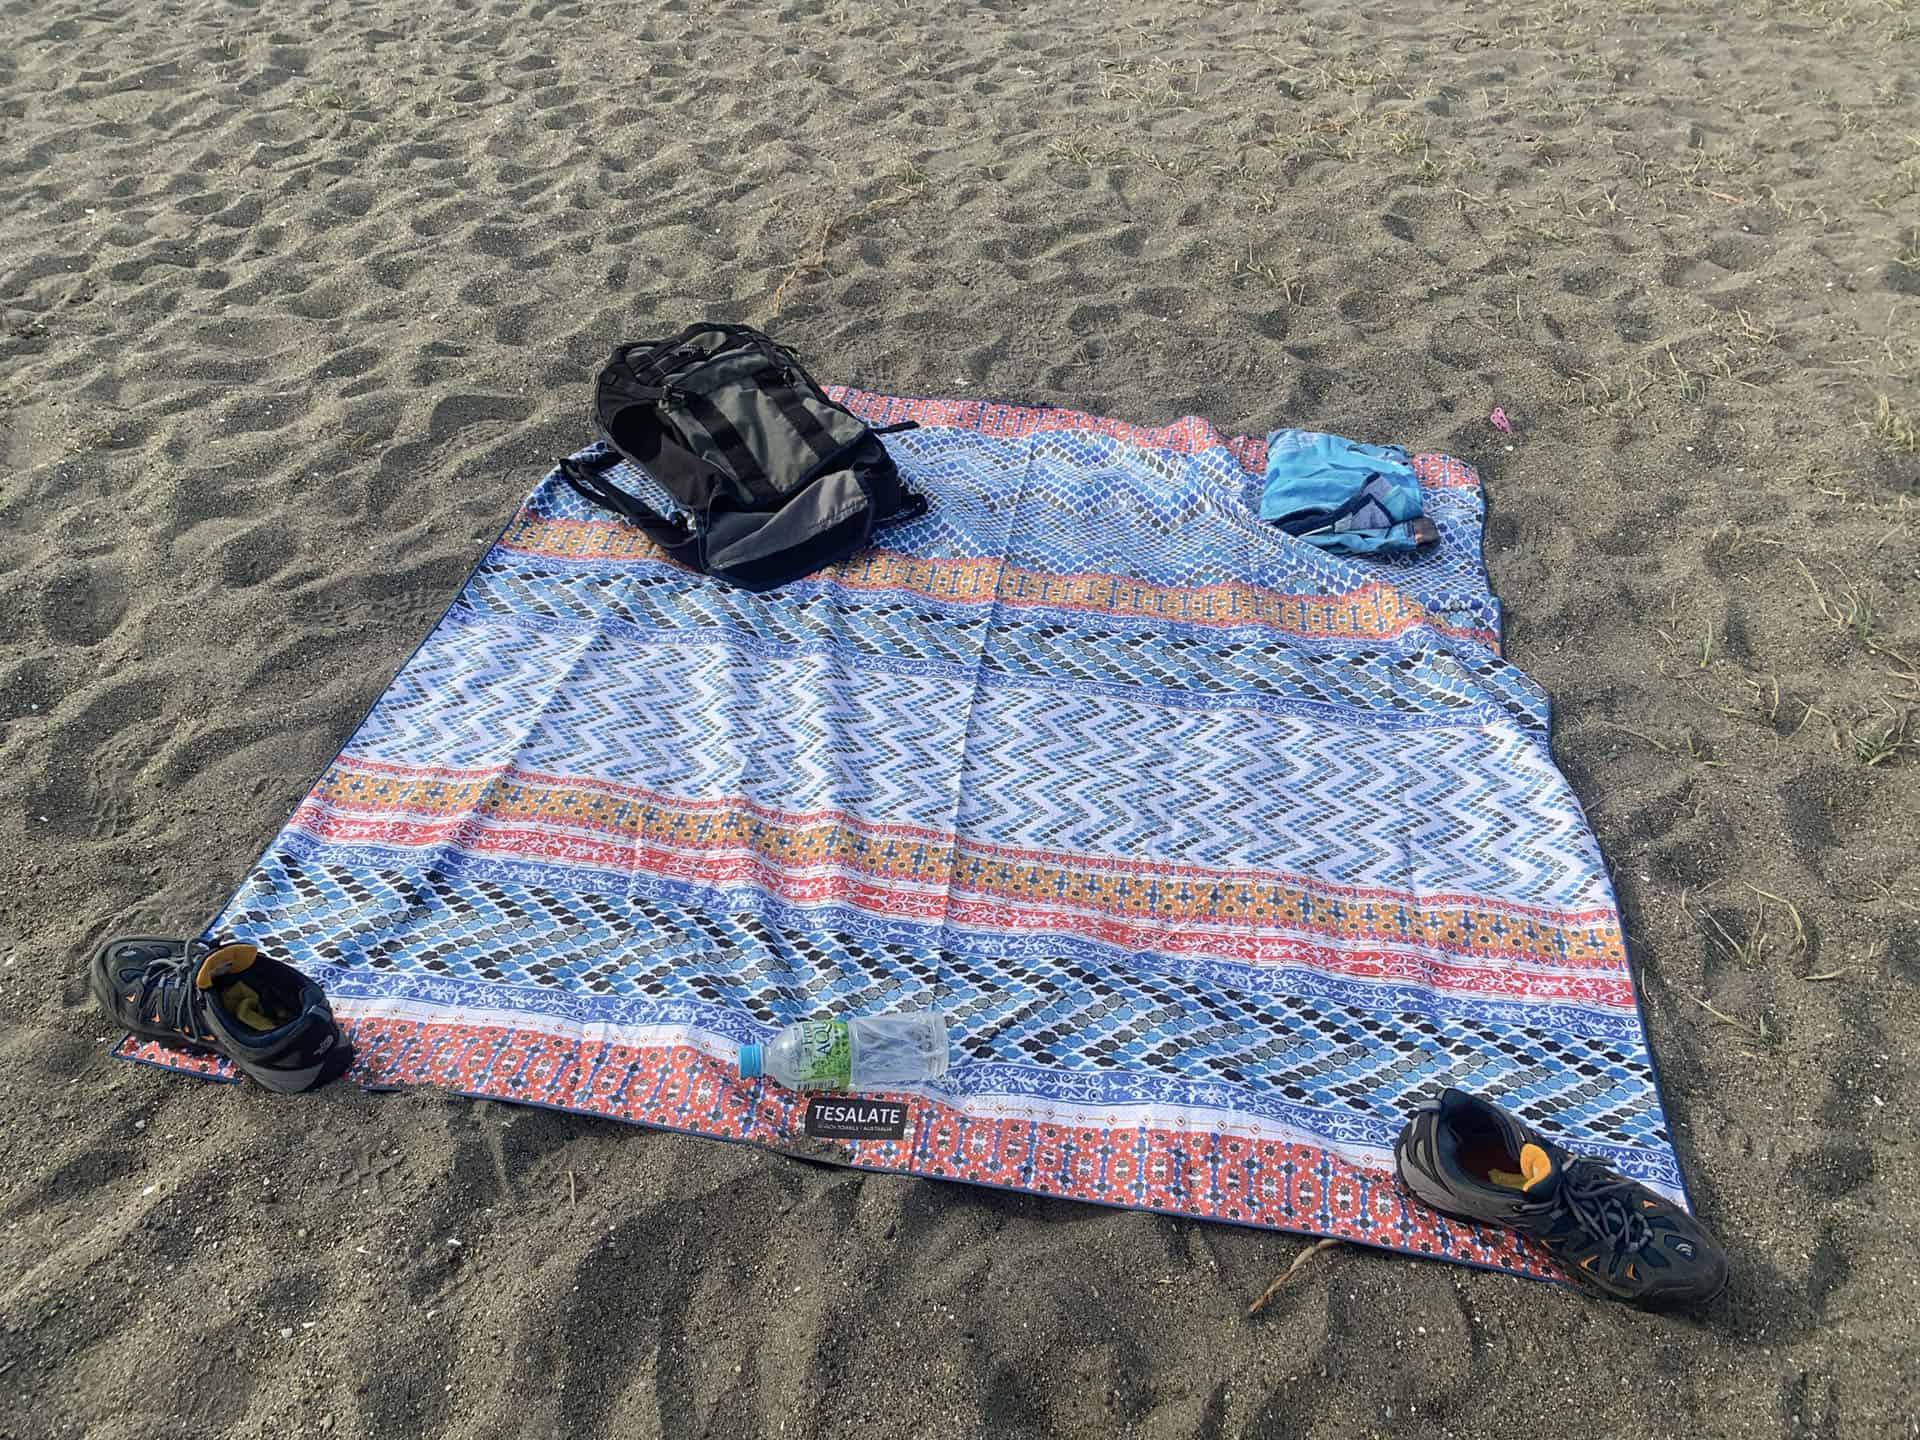 Tesalate Beach Towel - Travel Essentials List